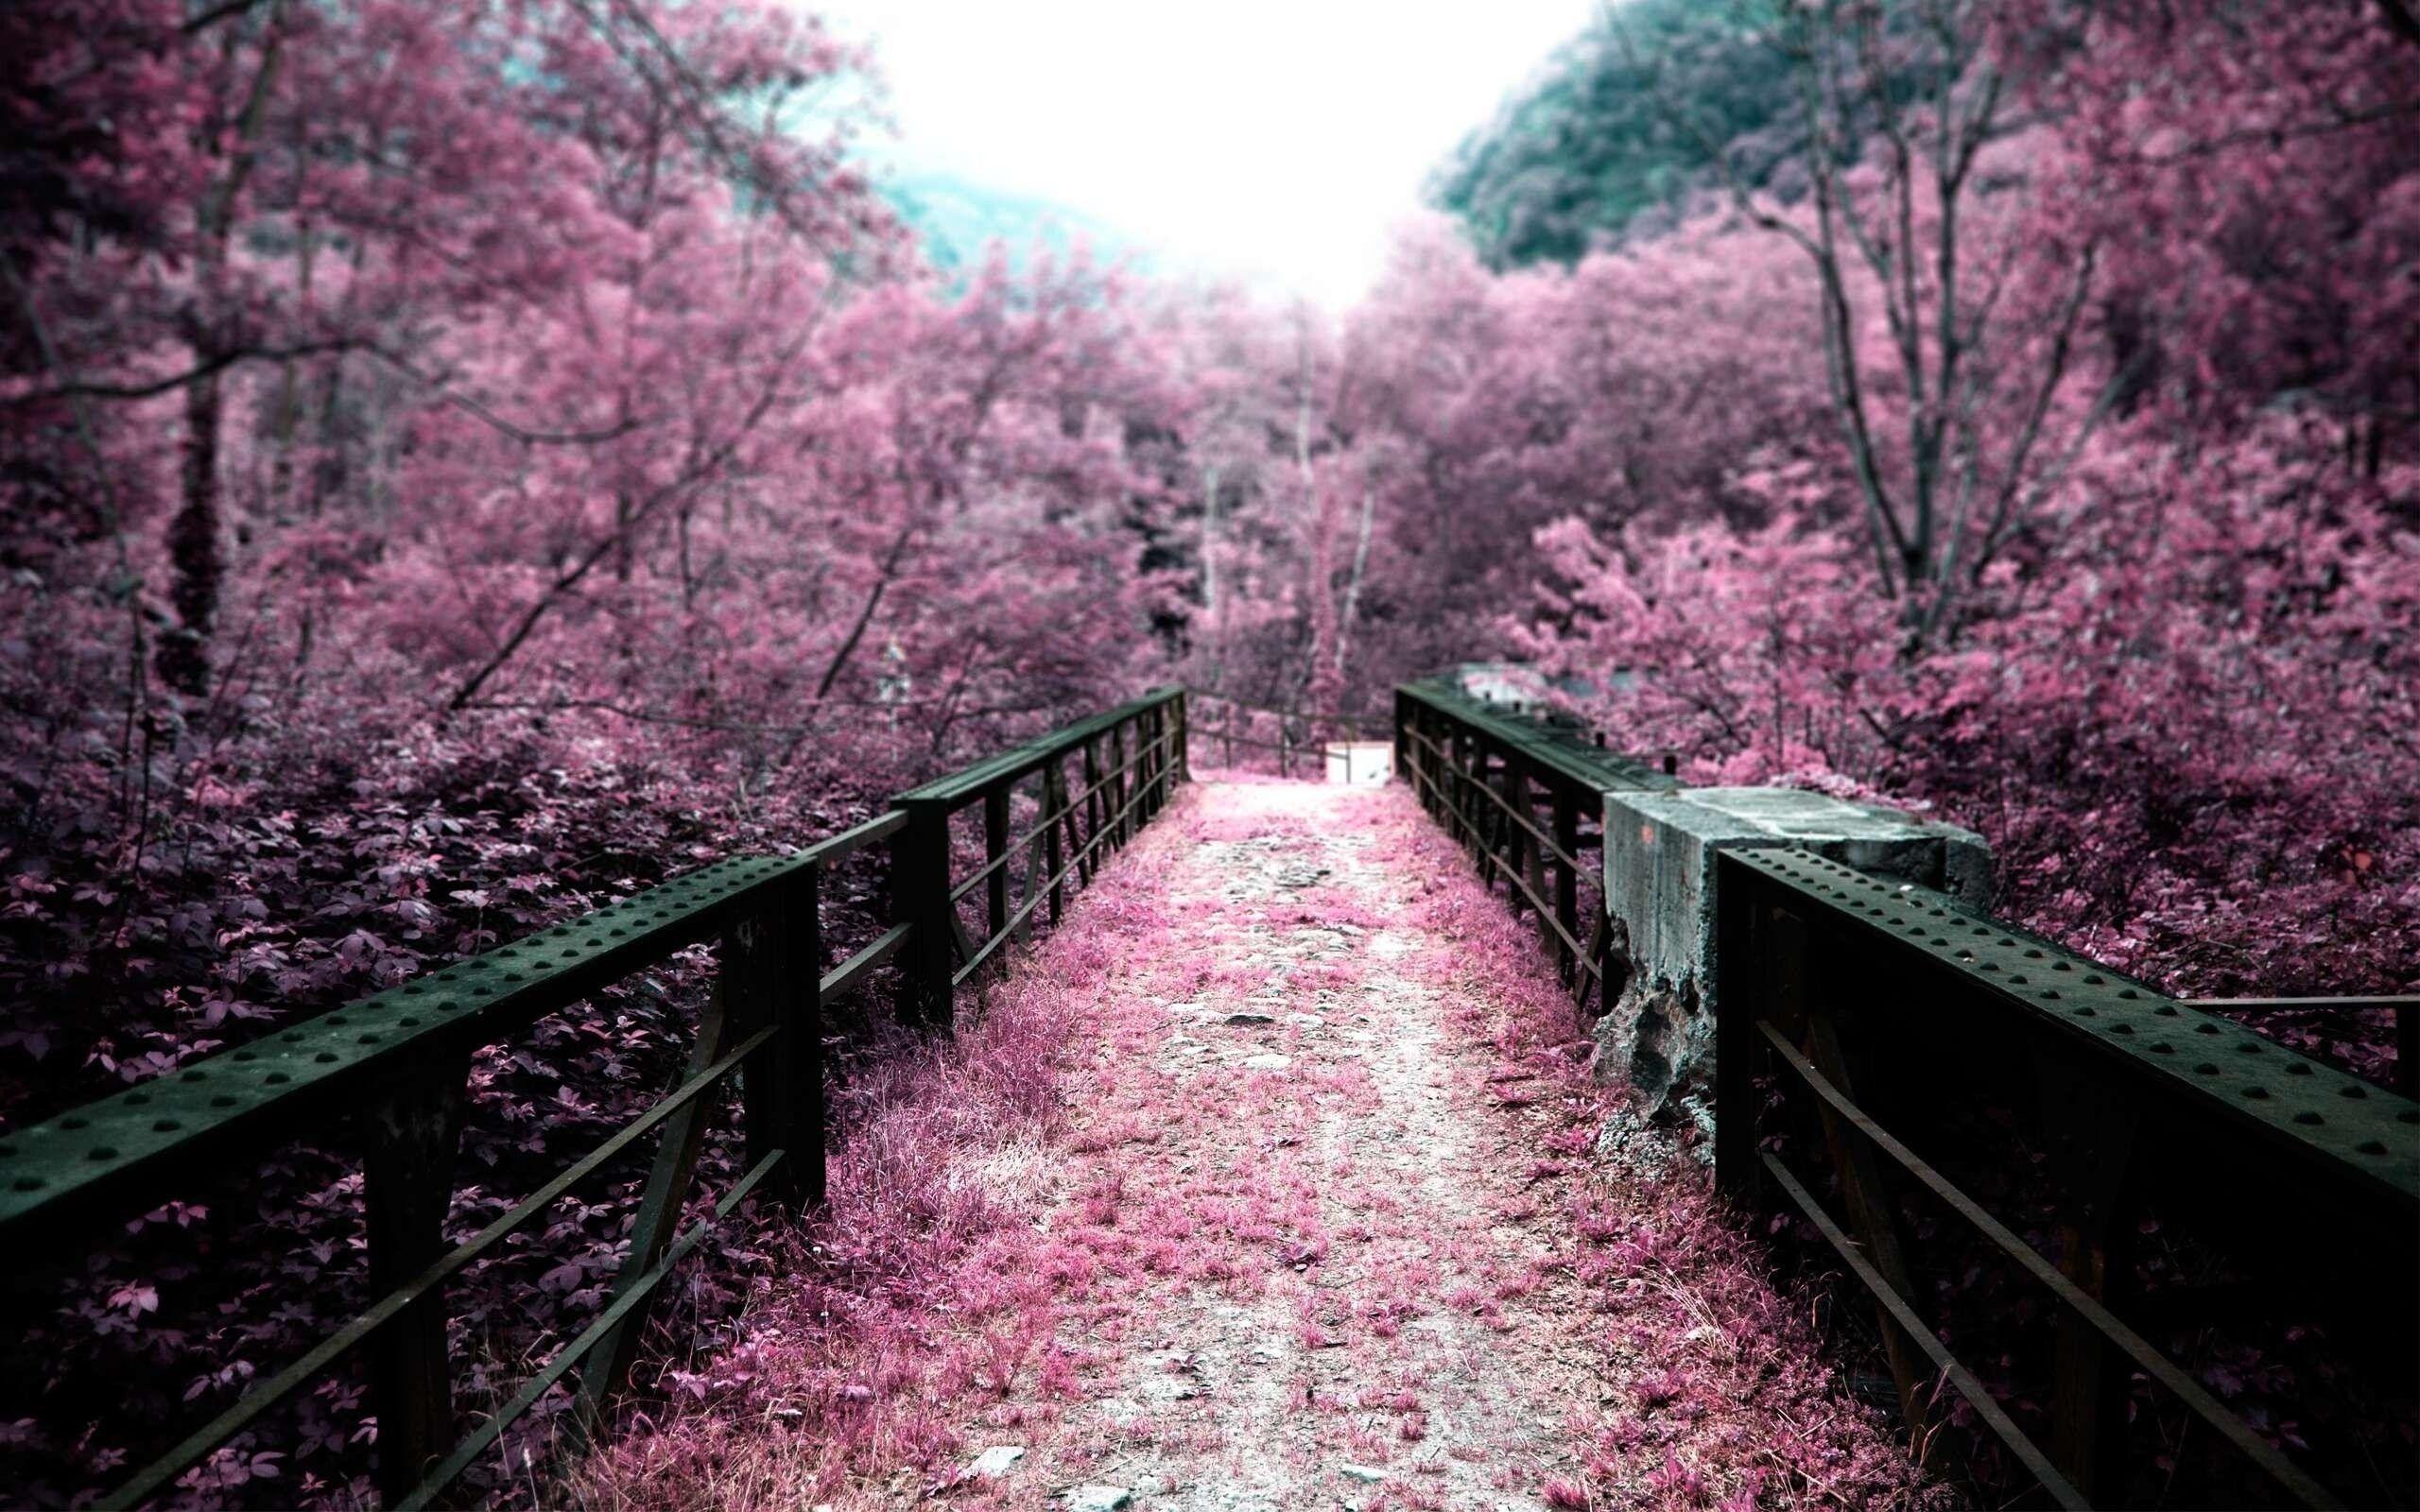 Sakura Wallpapers High Definition Cherry Blossom Wallpaper Best Flower Wallpaper Pink Flowers Wallpaper